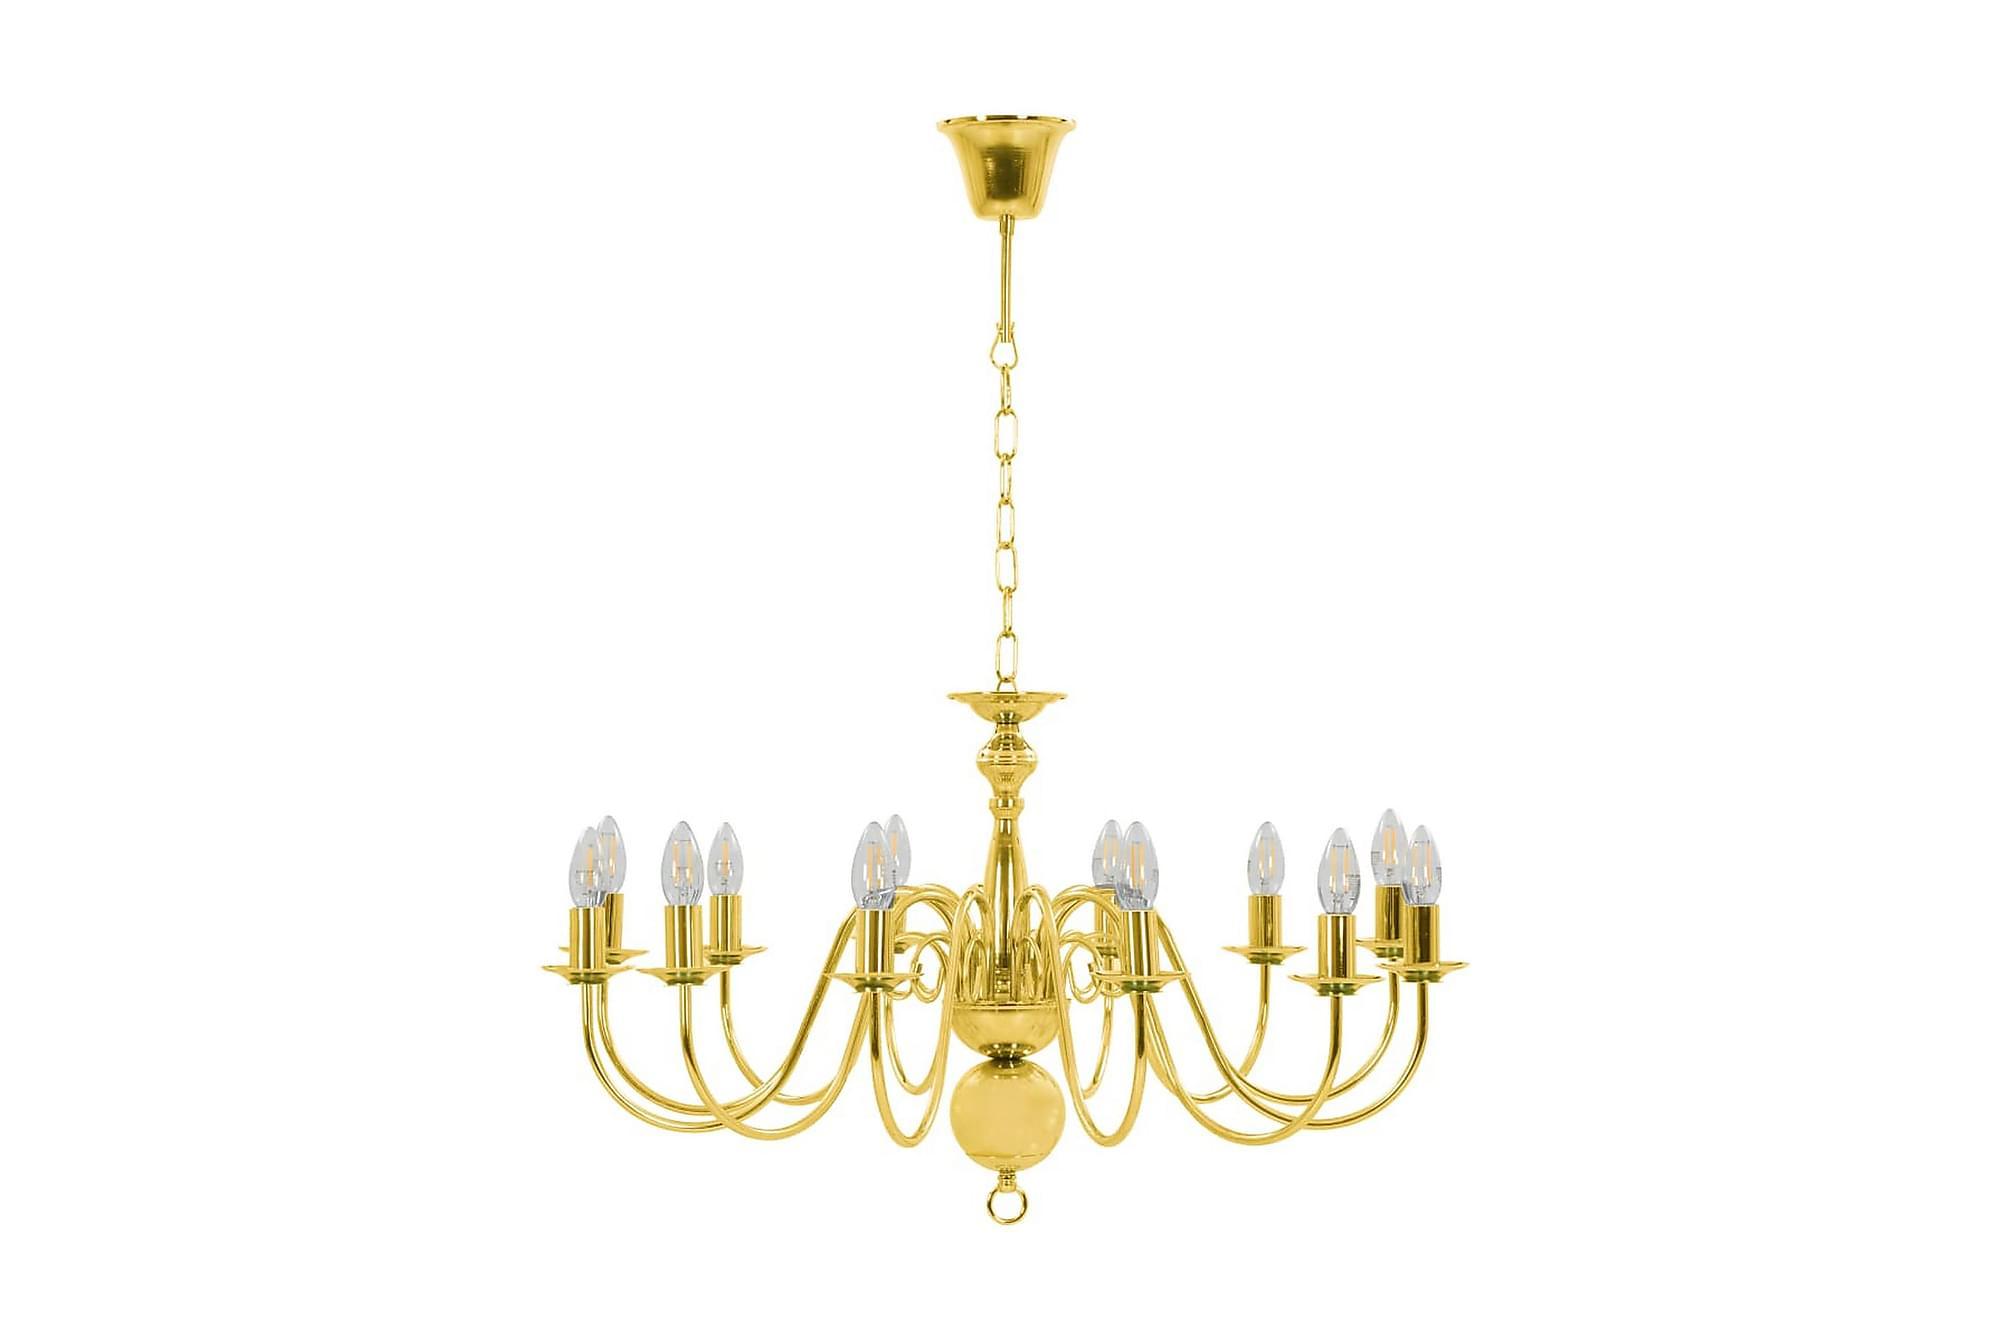 Takkrona guld 12 x E14-glödlampor, Taklampor